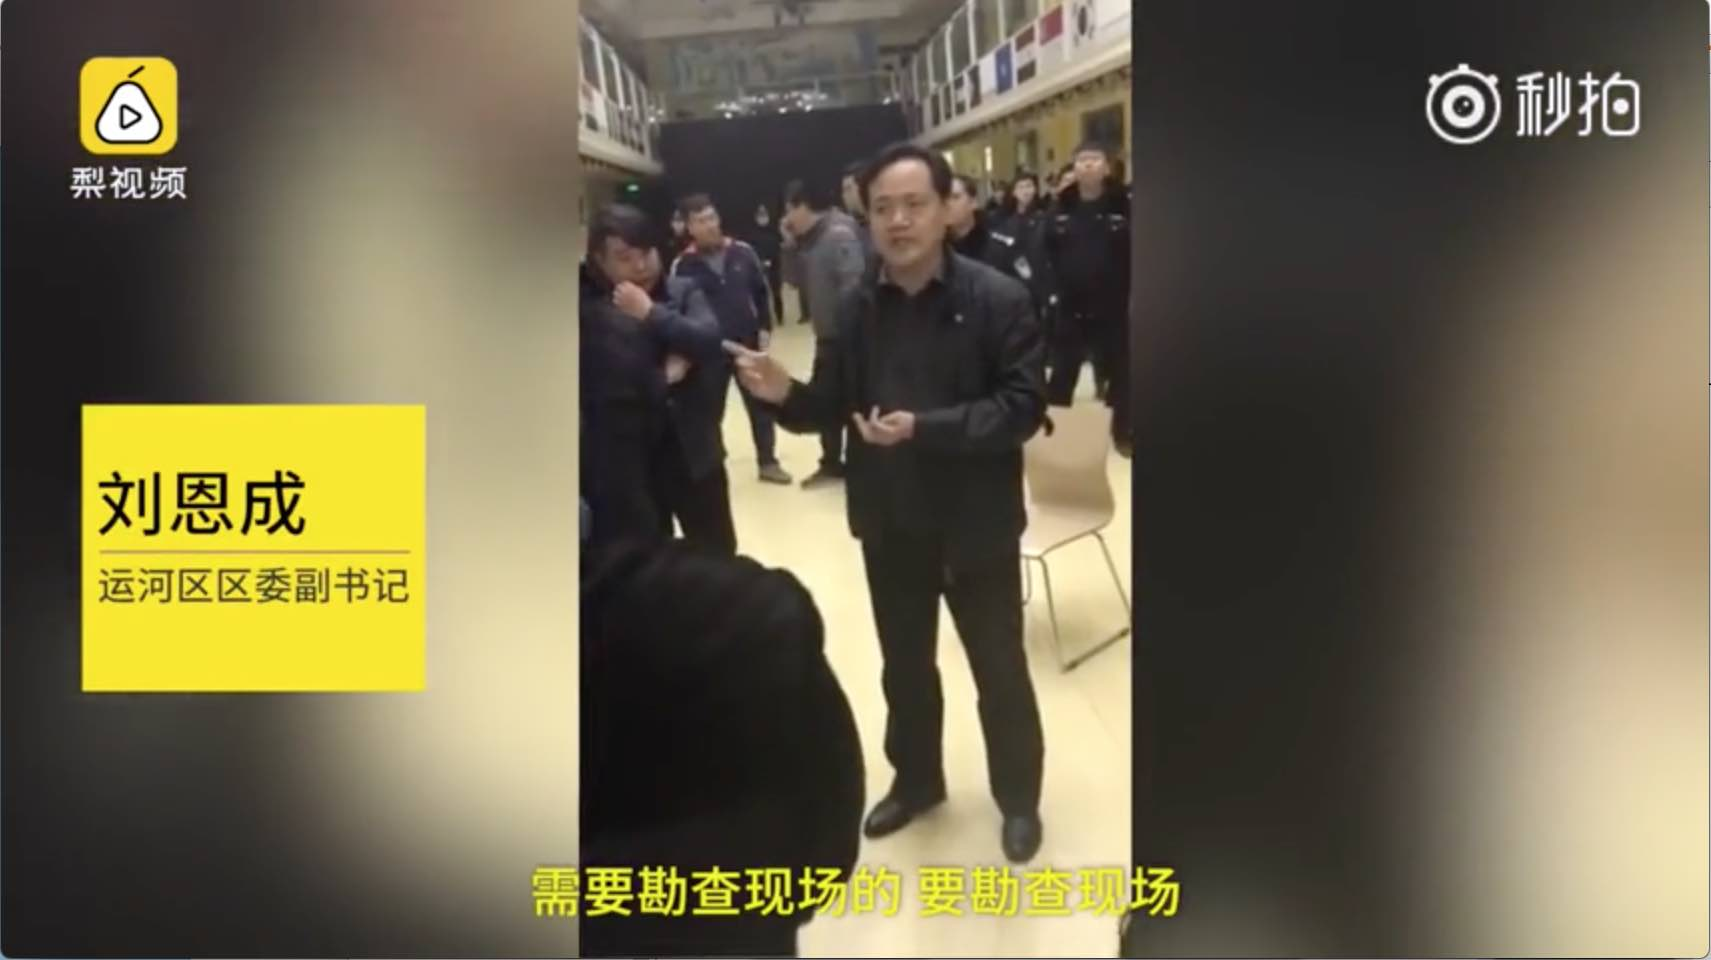 【CDTV】被删视频:河北沧州红黄蓝幼儿园被曝针扎幼童